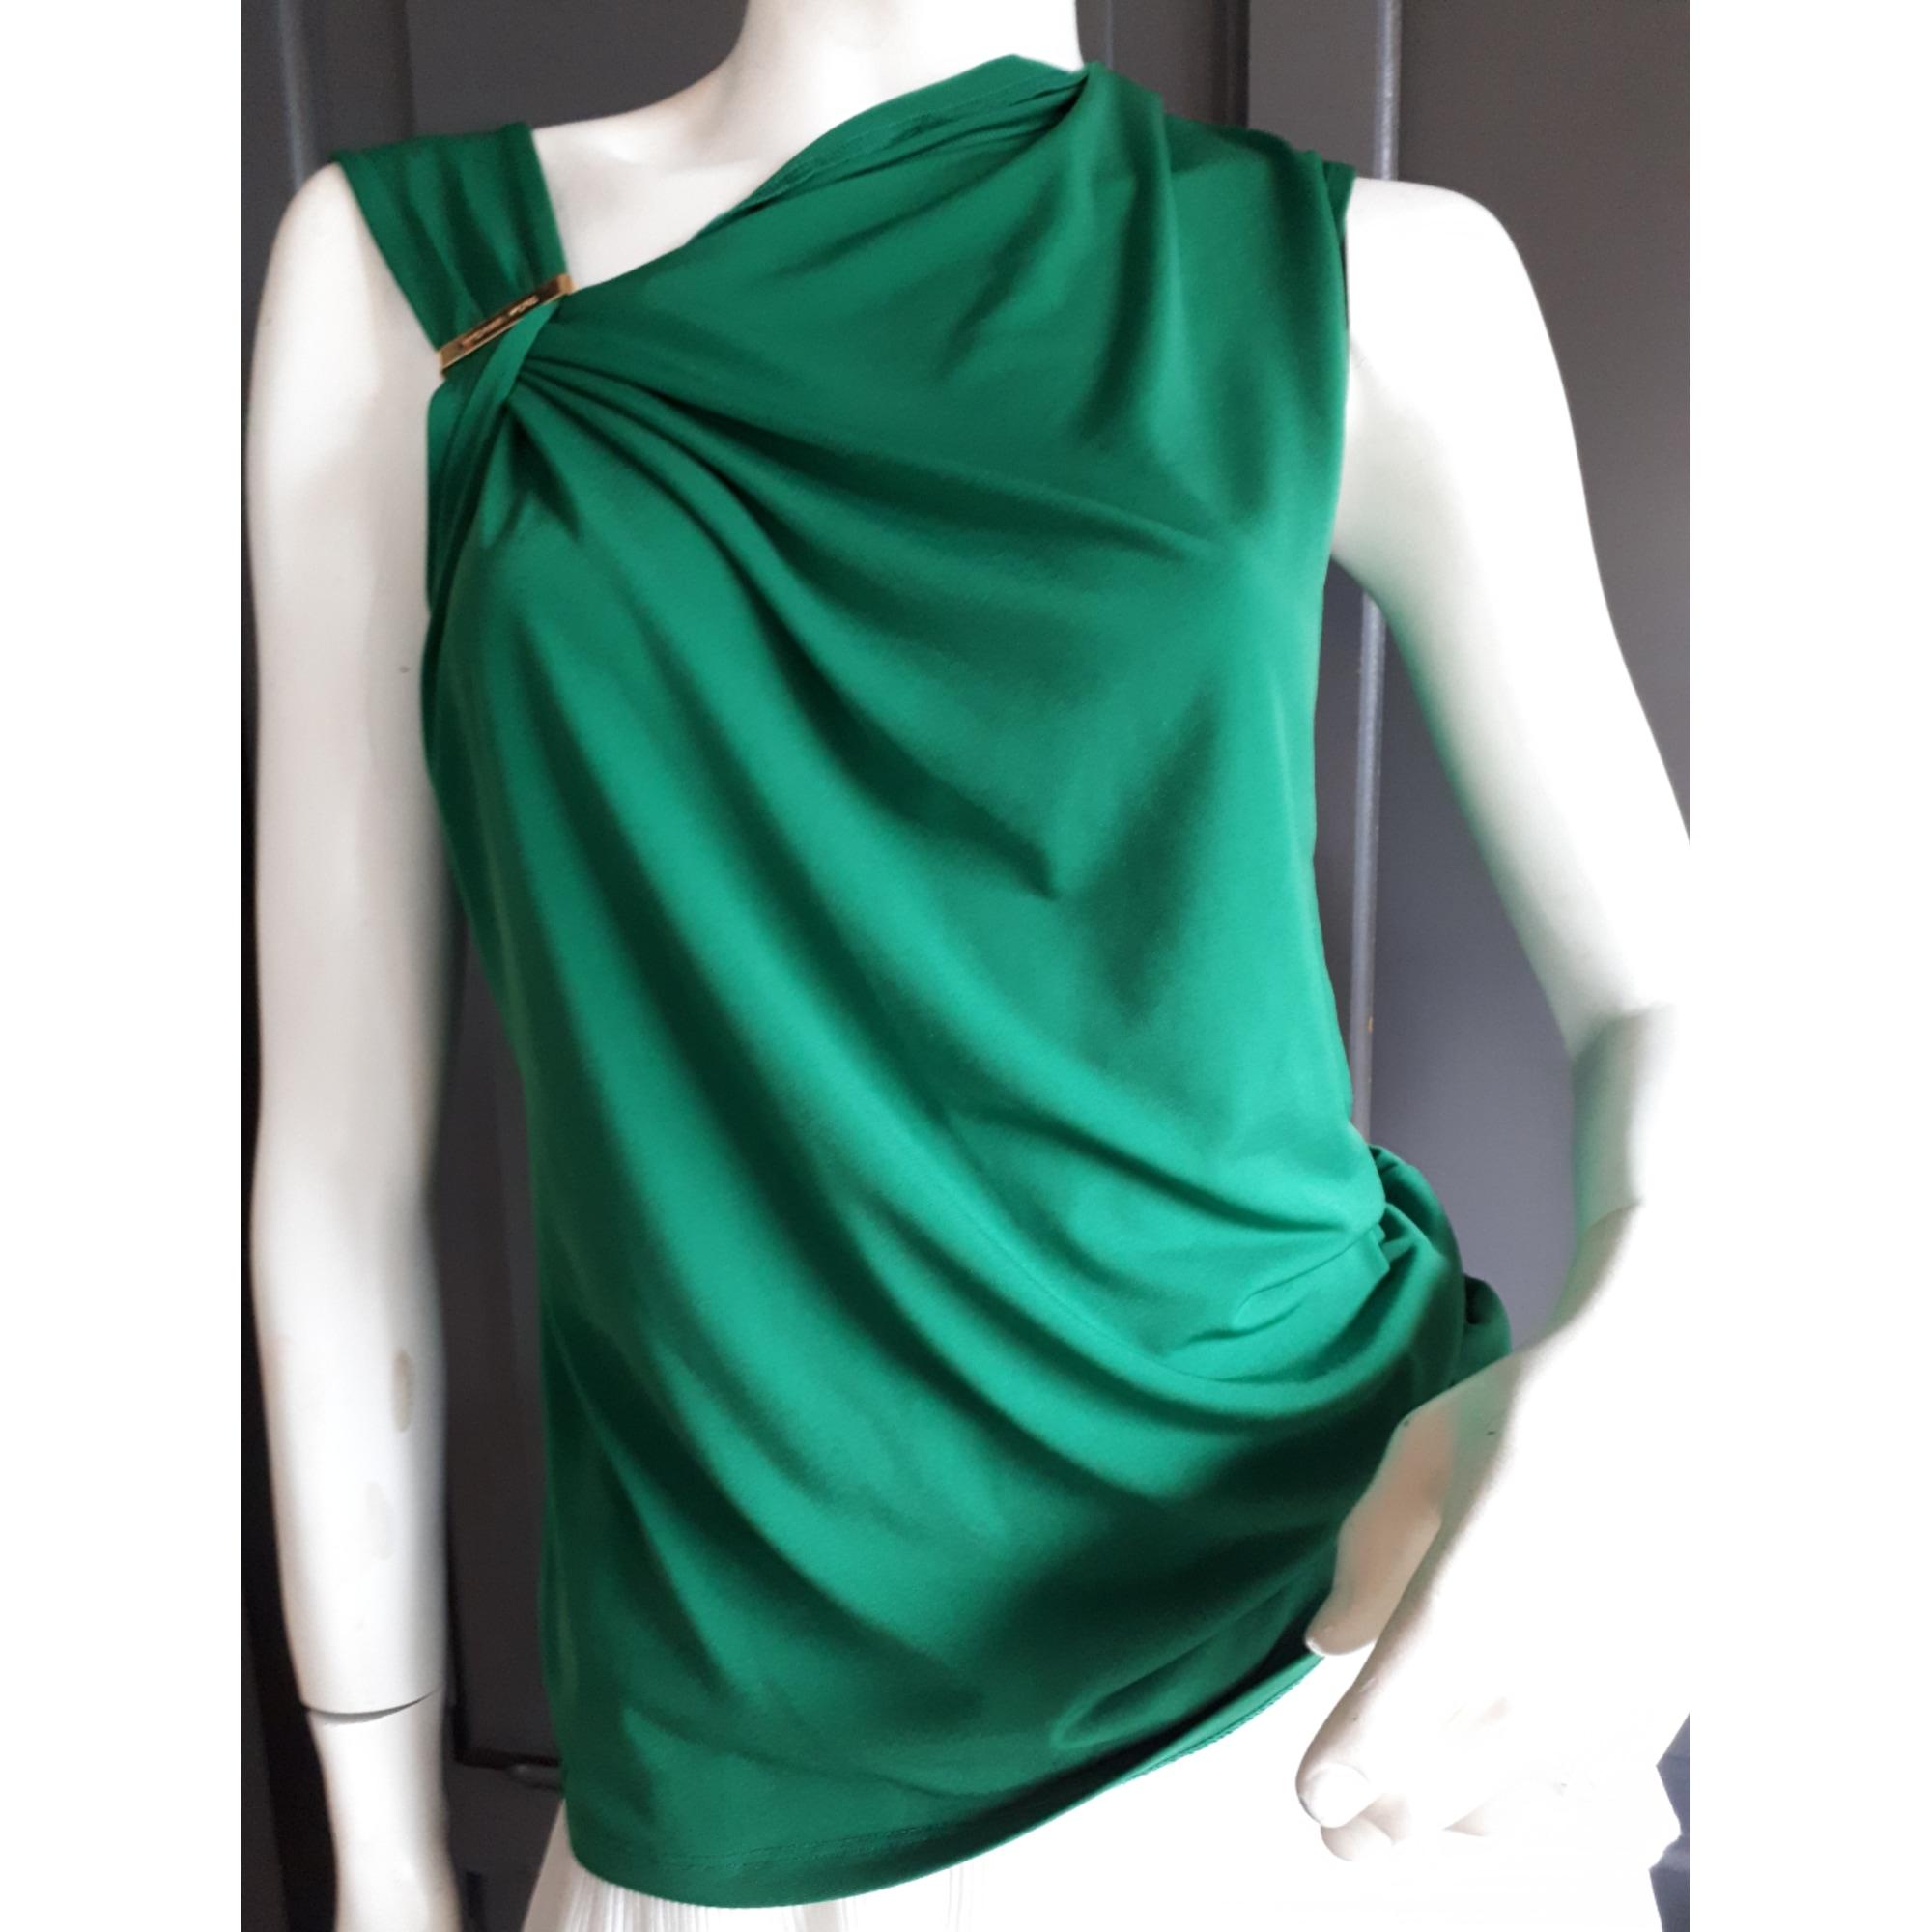 Top, t-shirt MICHAEL KORS Verde